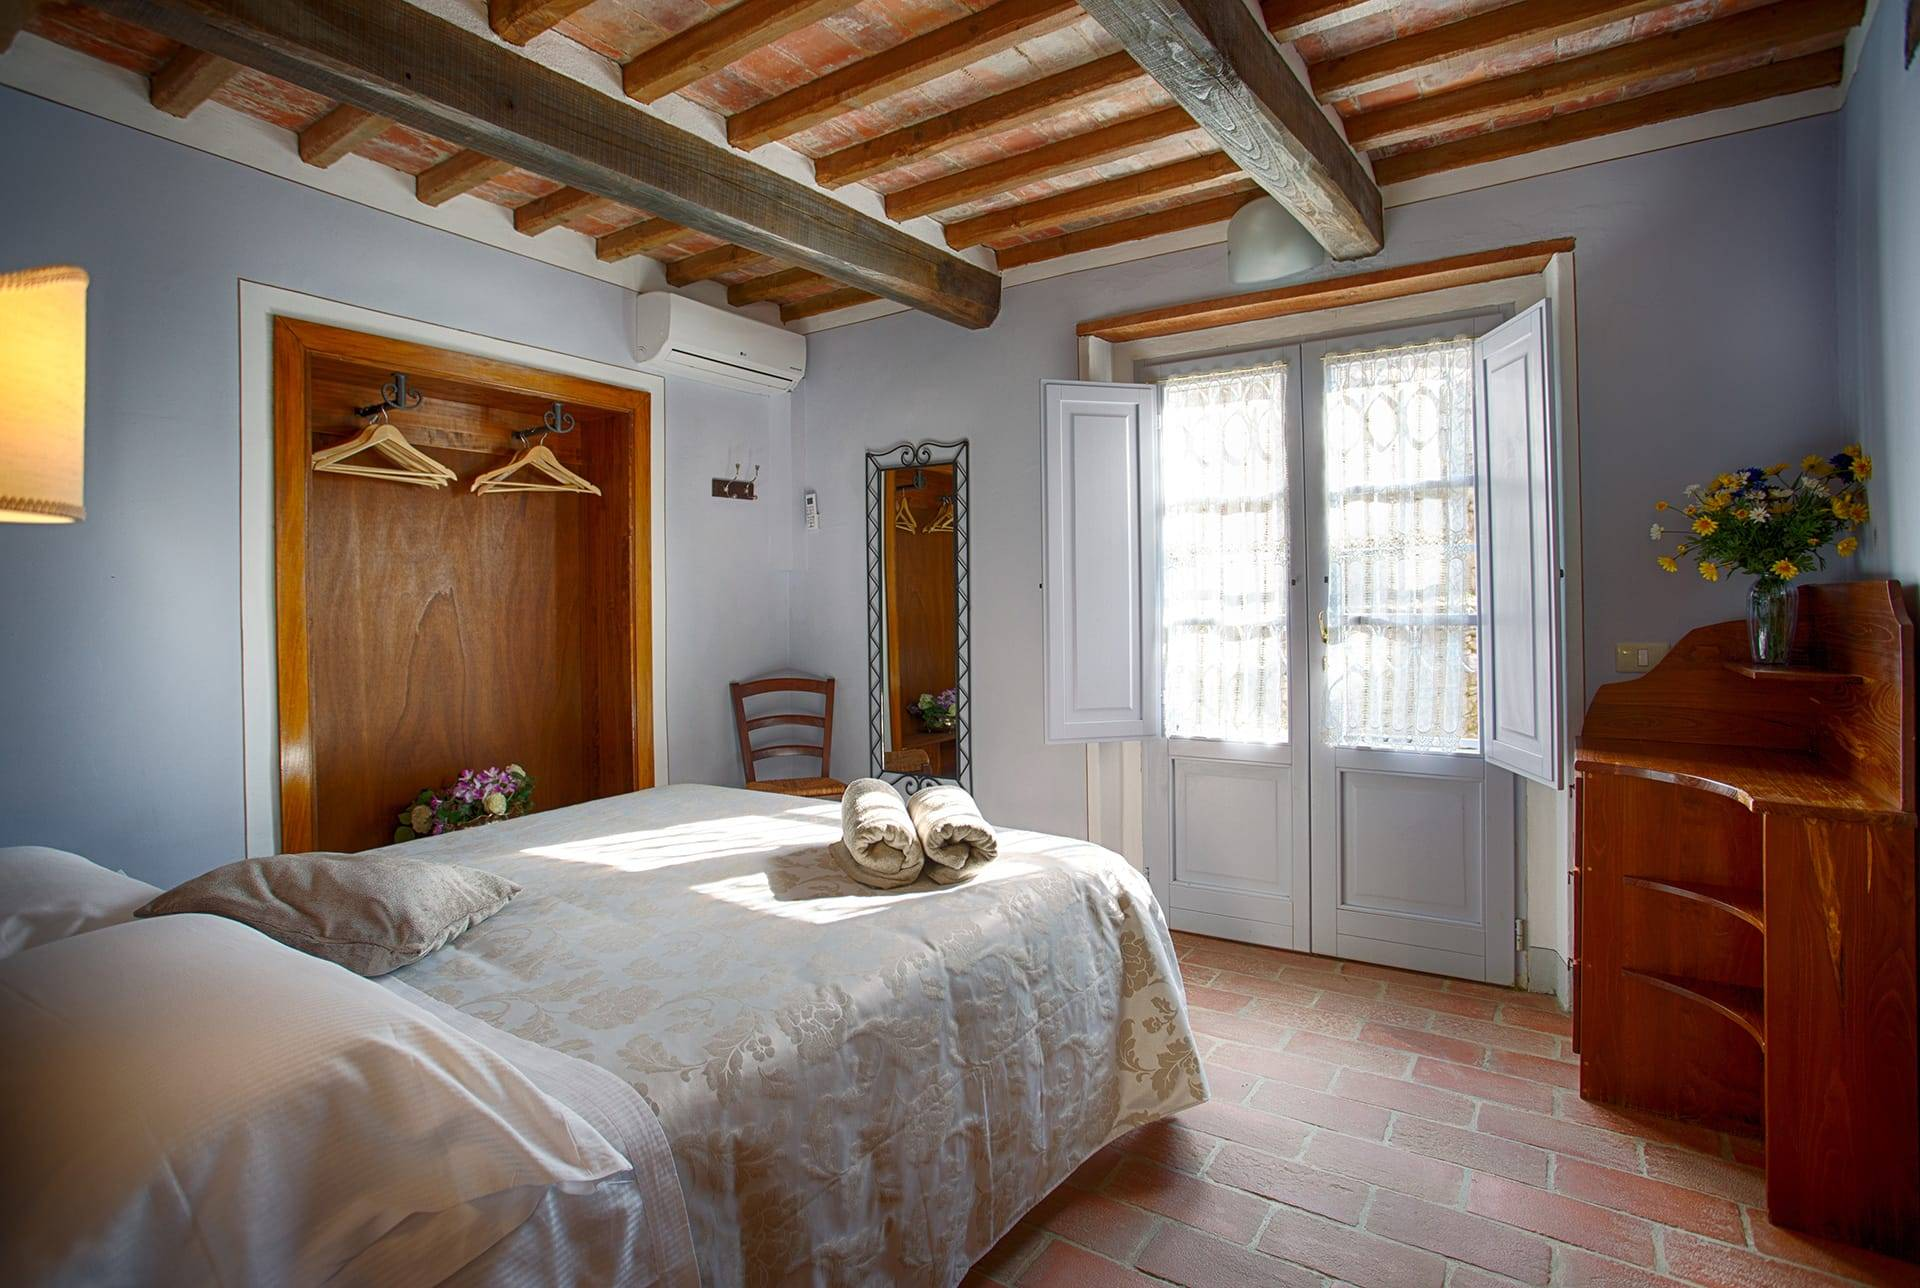 La Capanna slaapkamer